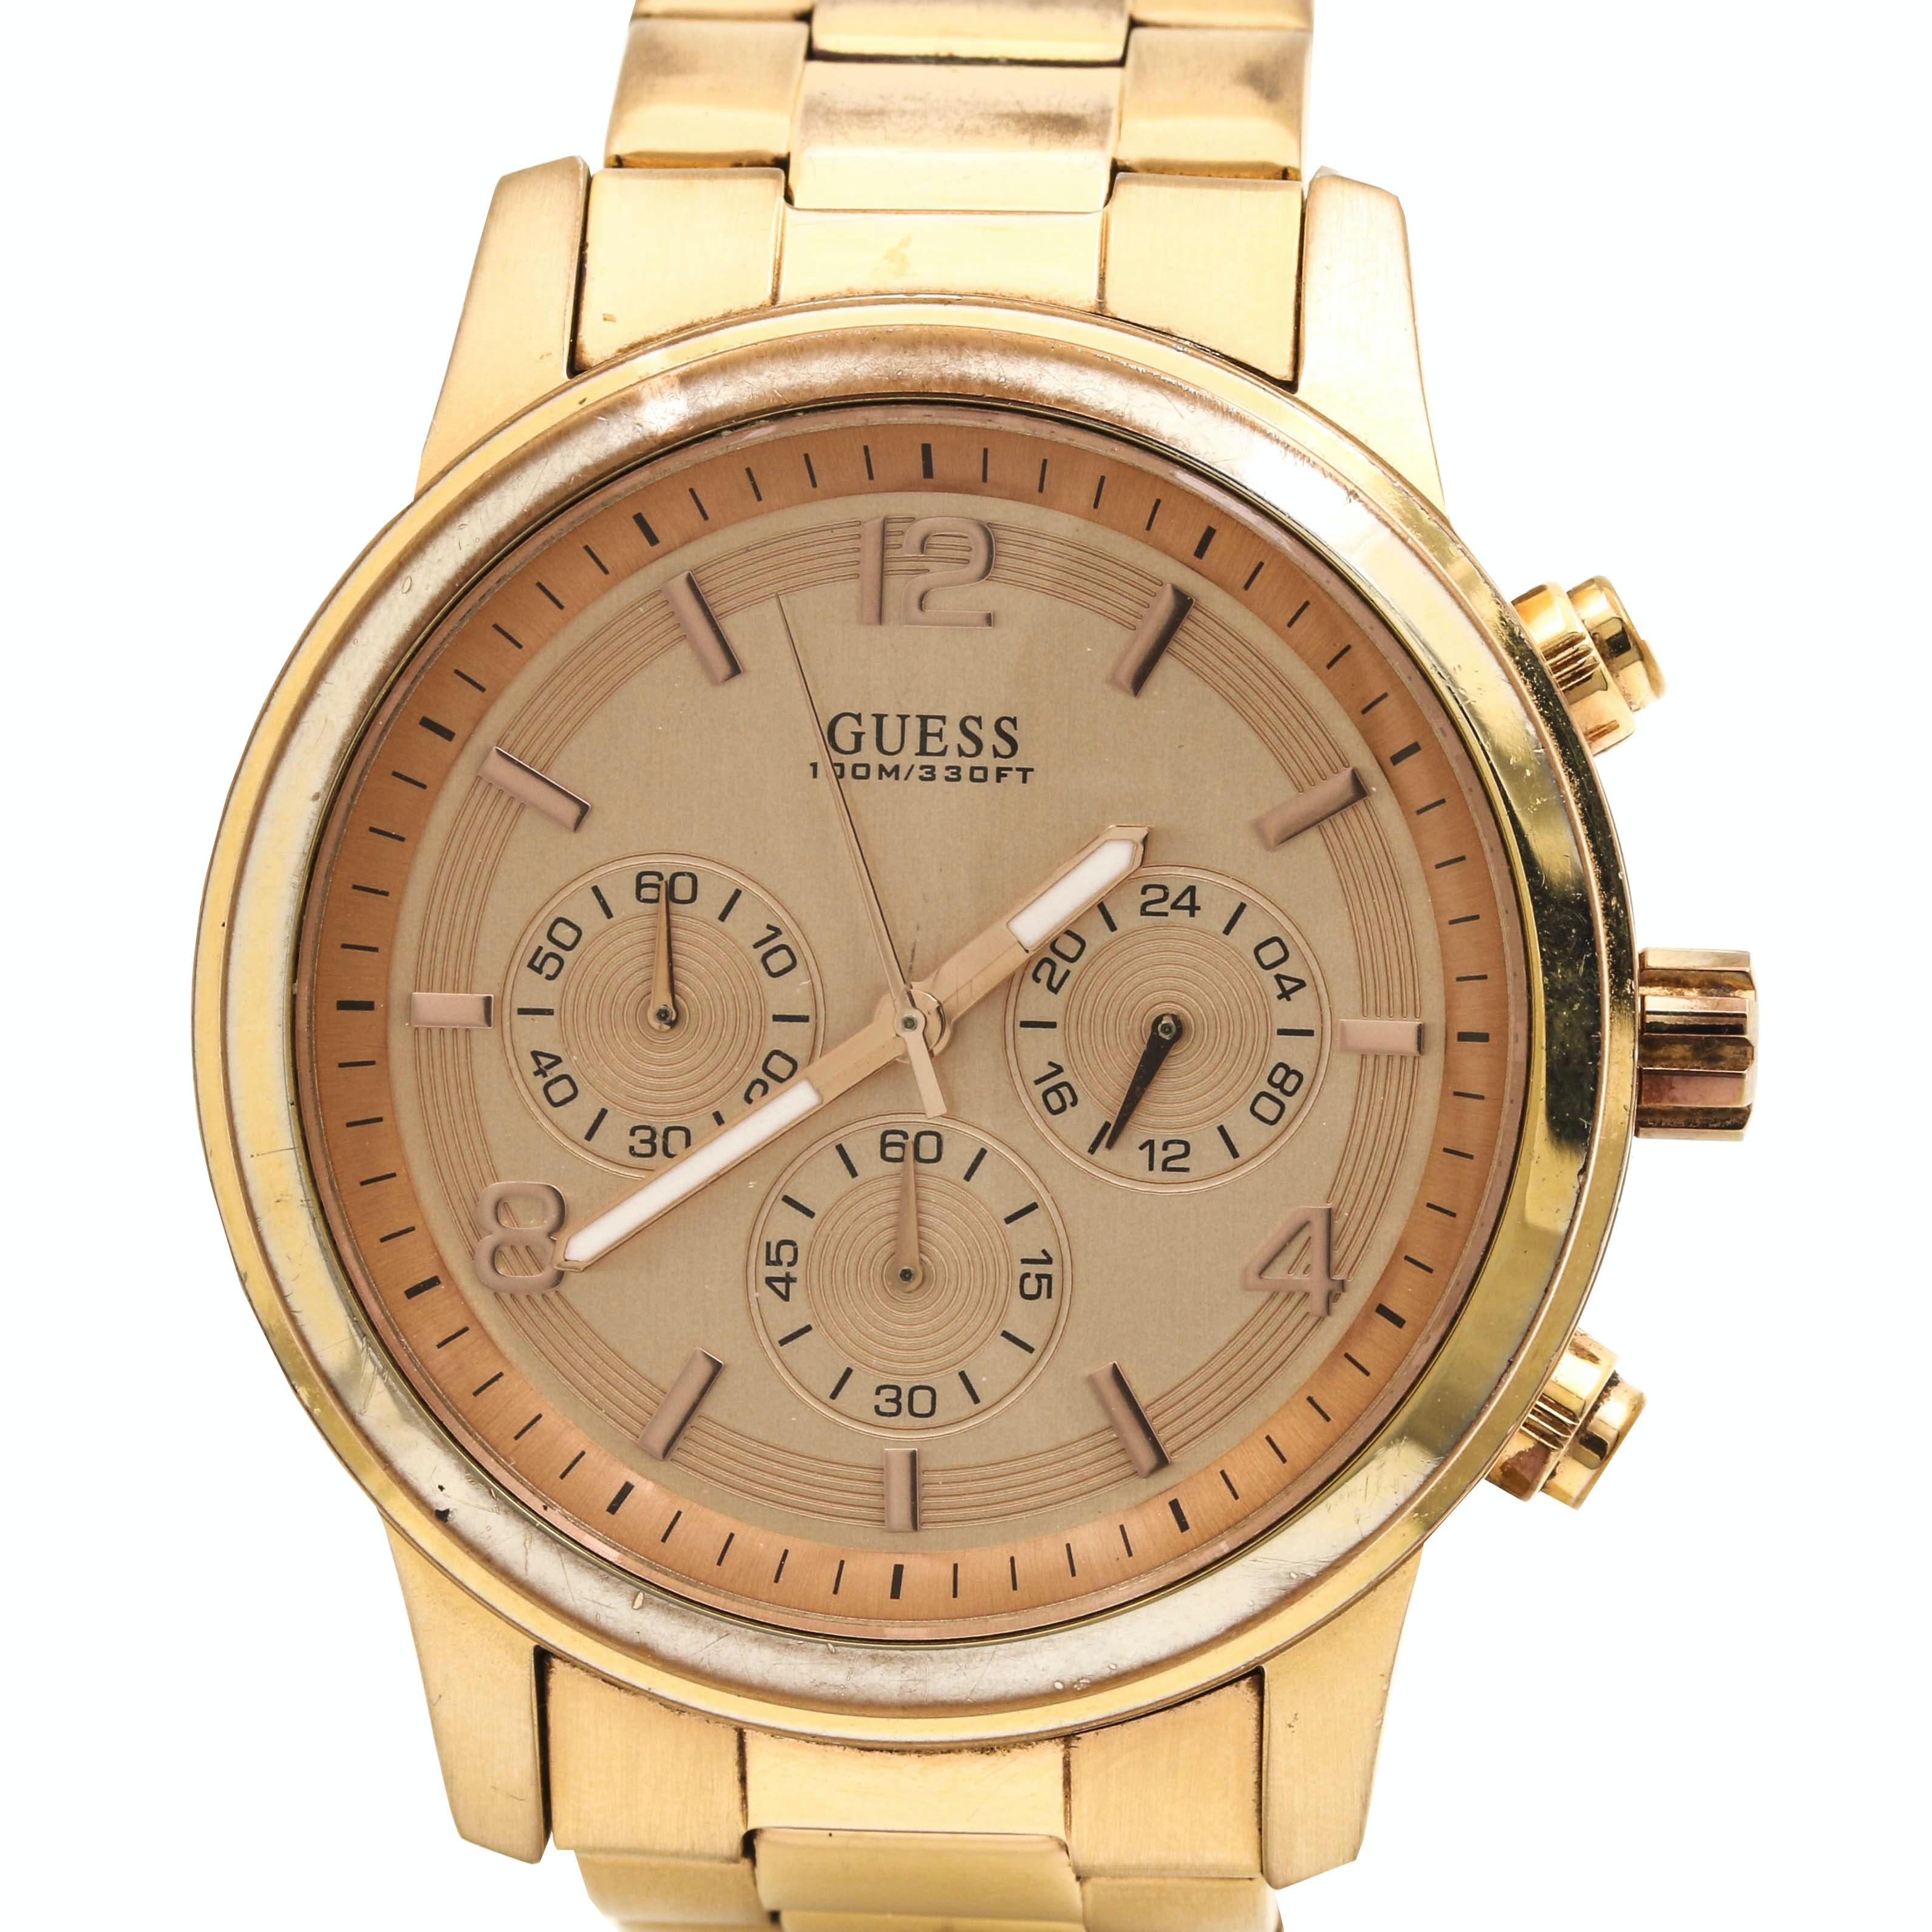 Guess Chronograph Wristwatch